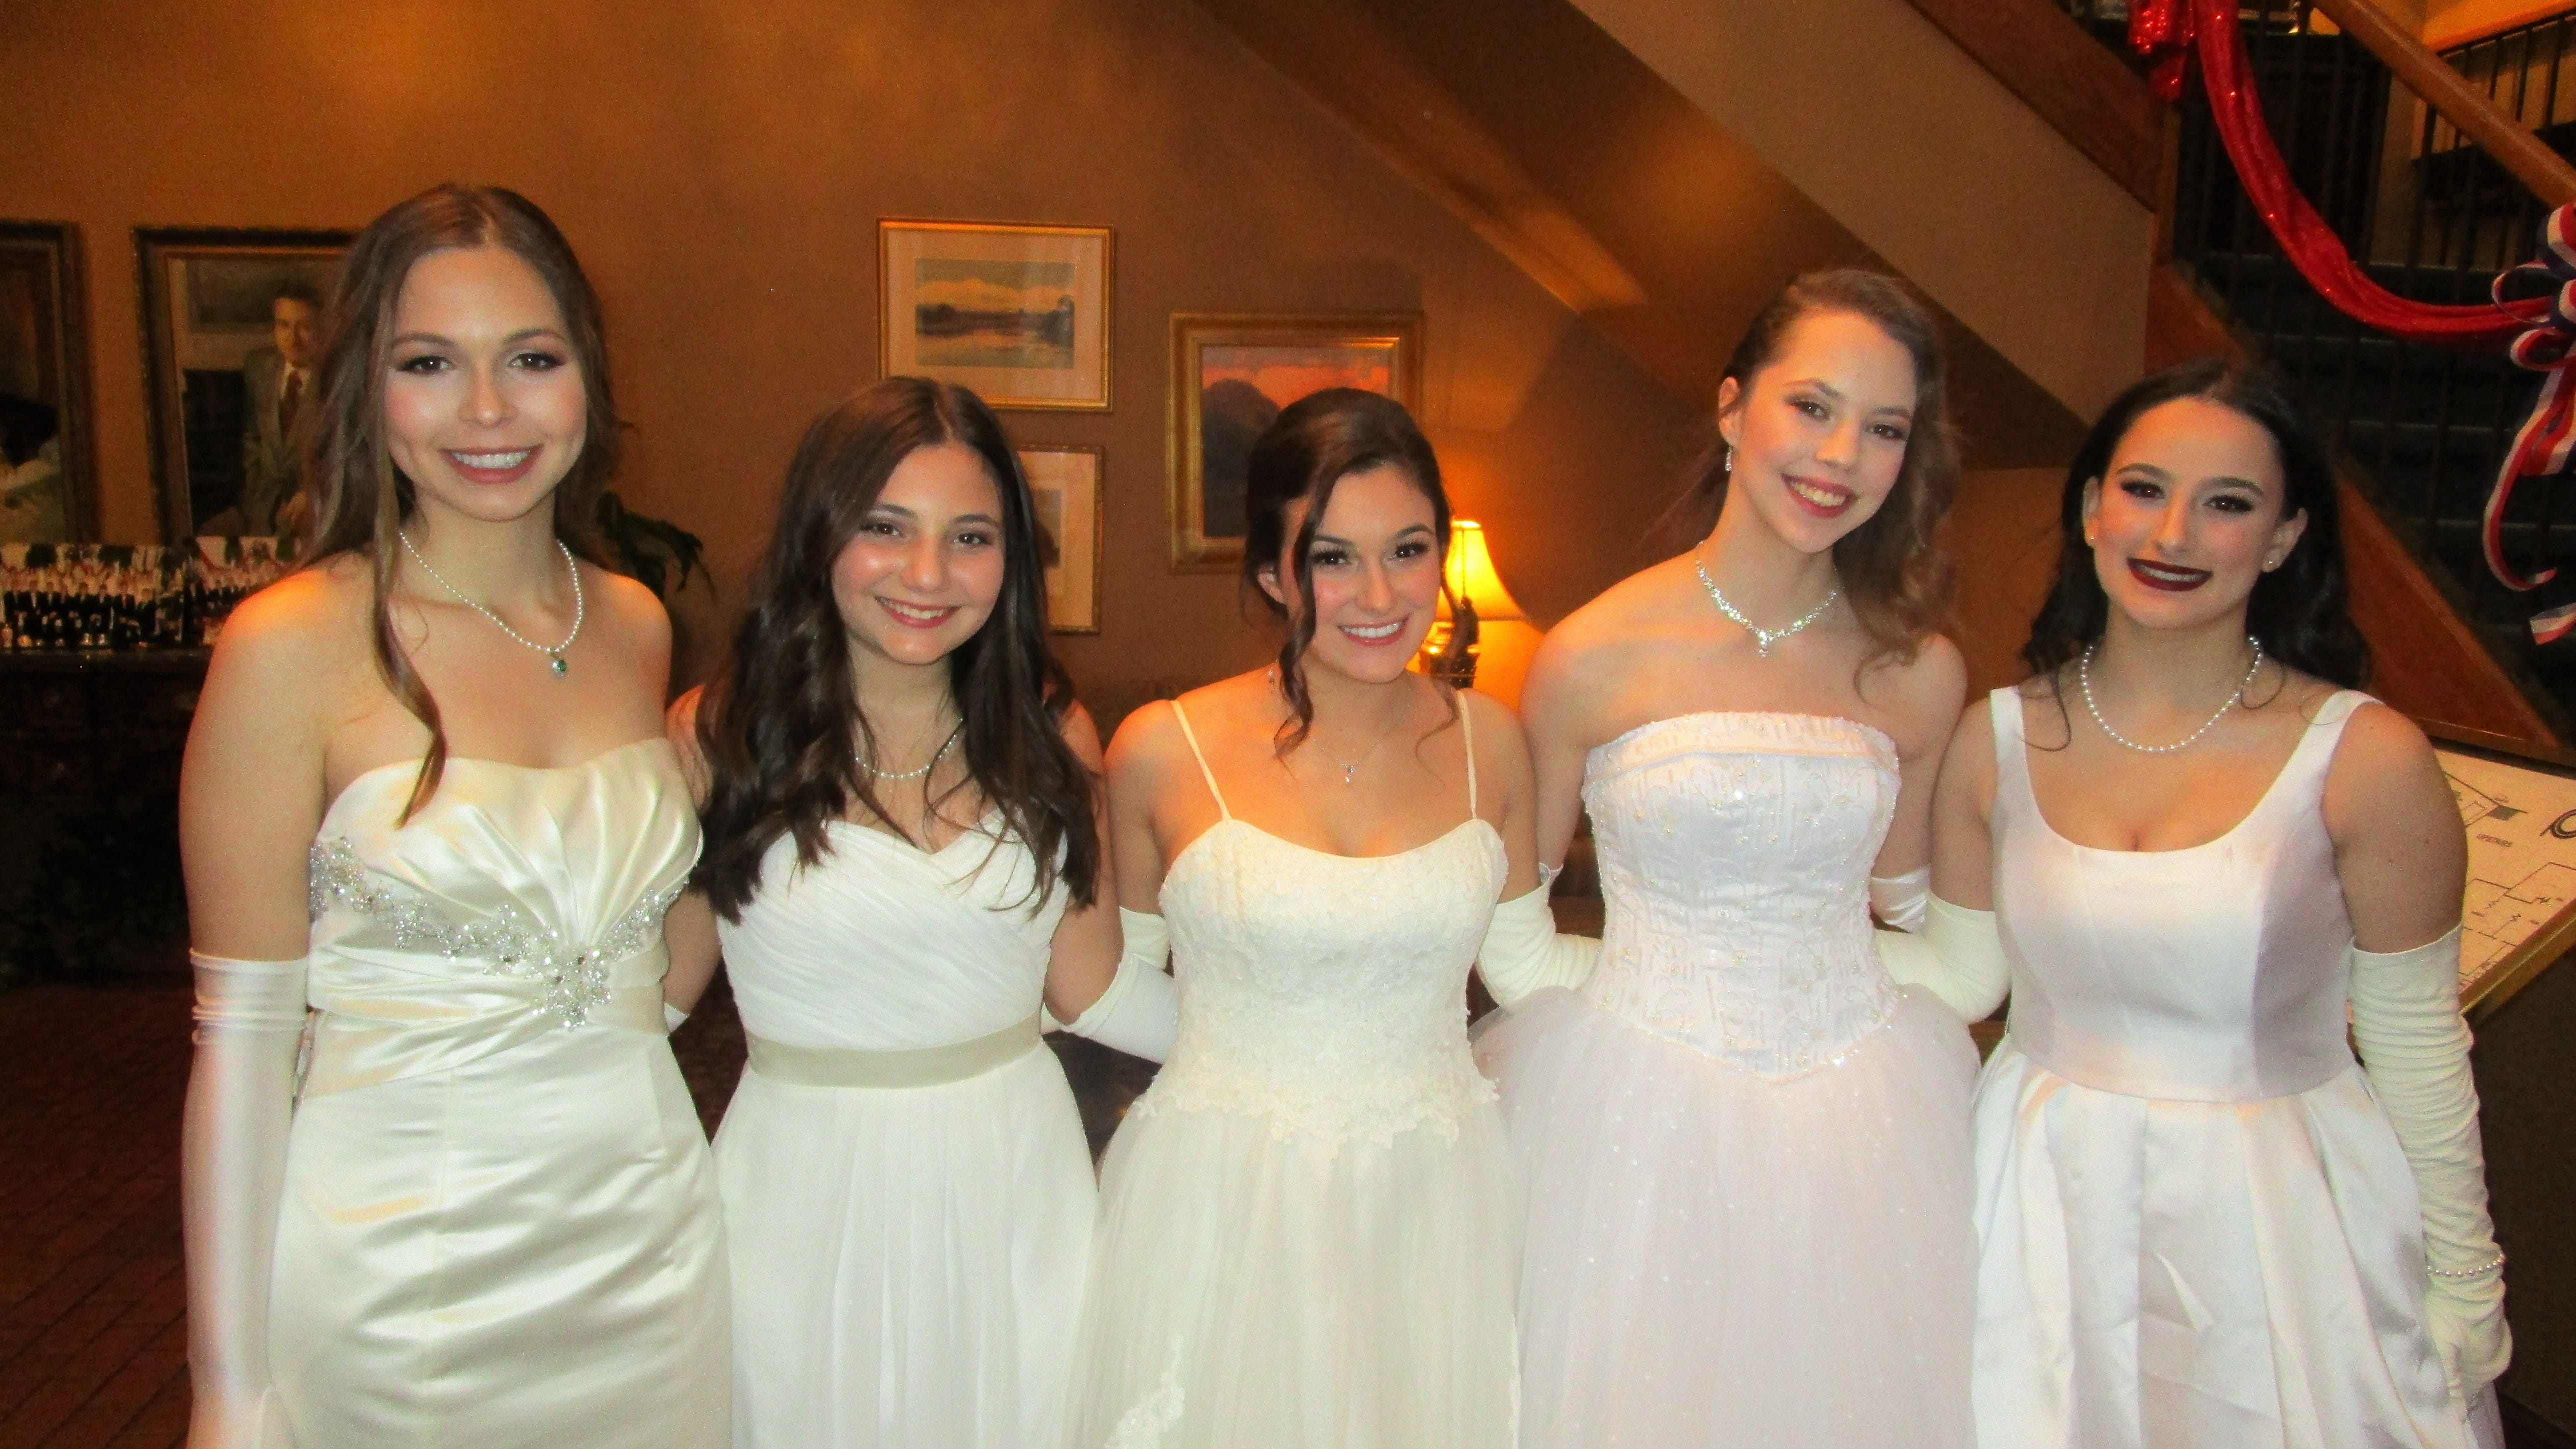 Elise Lipari, Lauren Franques, Anna Grace Franques, Emily Burdette and Cydney Theard